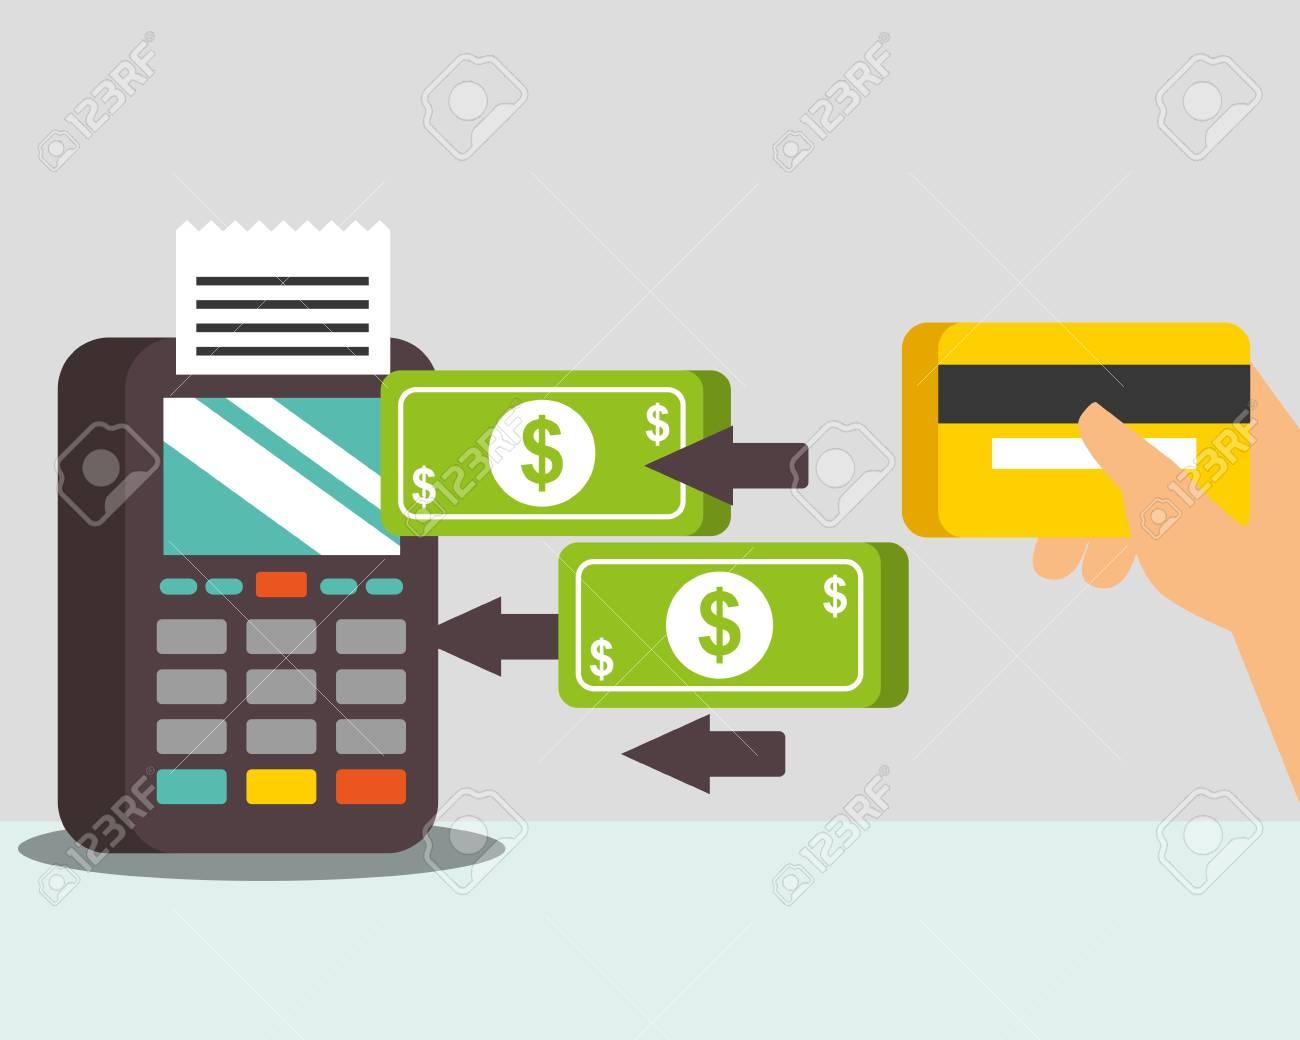 nfc payment technology transfer money dataphone hand holding credit card vector illustration - 112380581